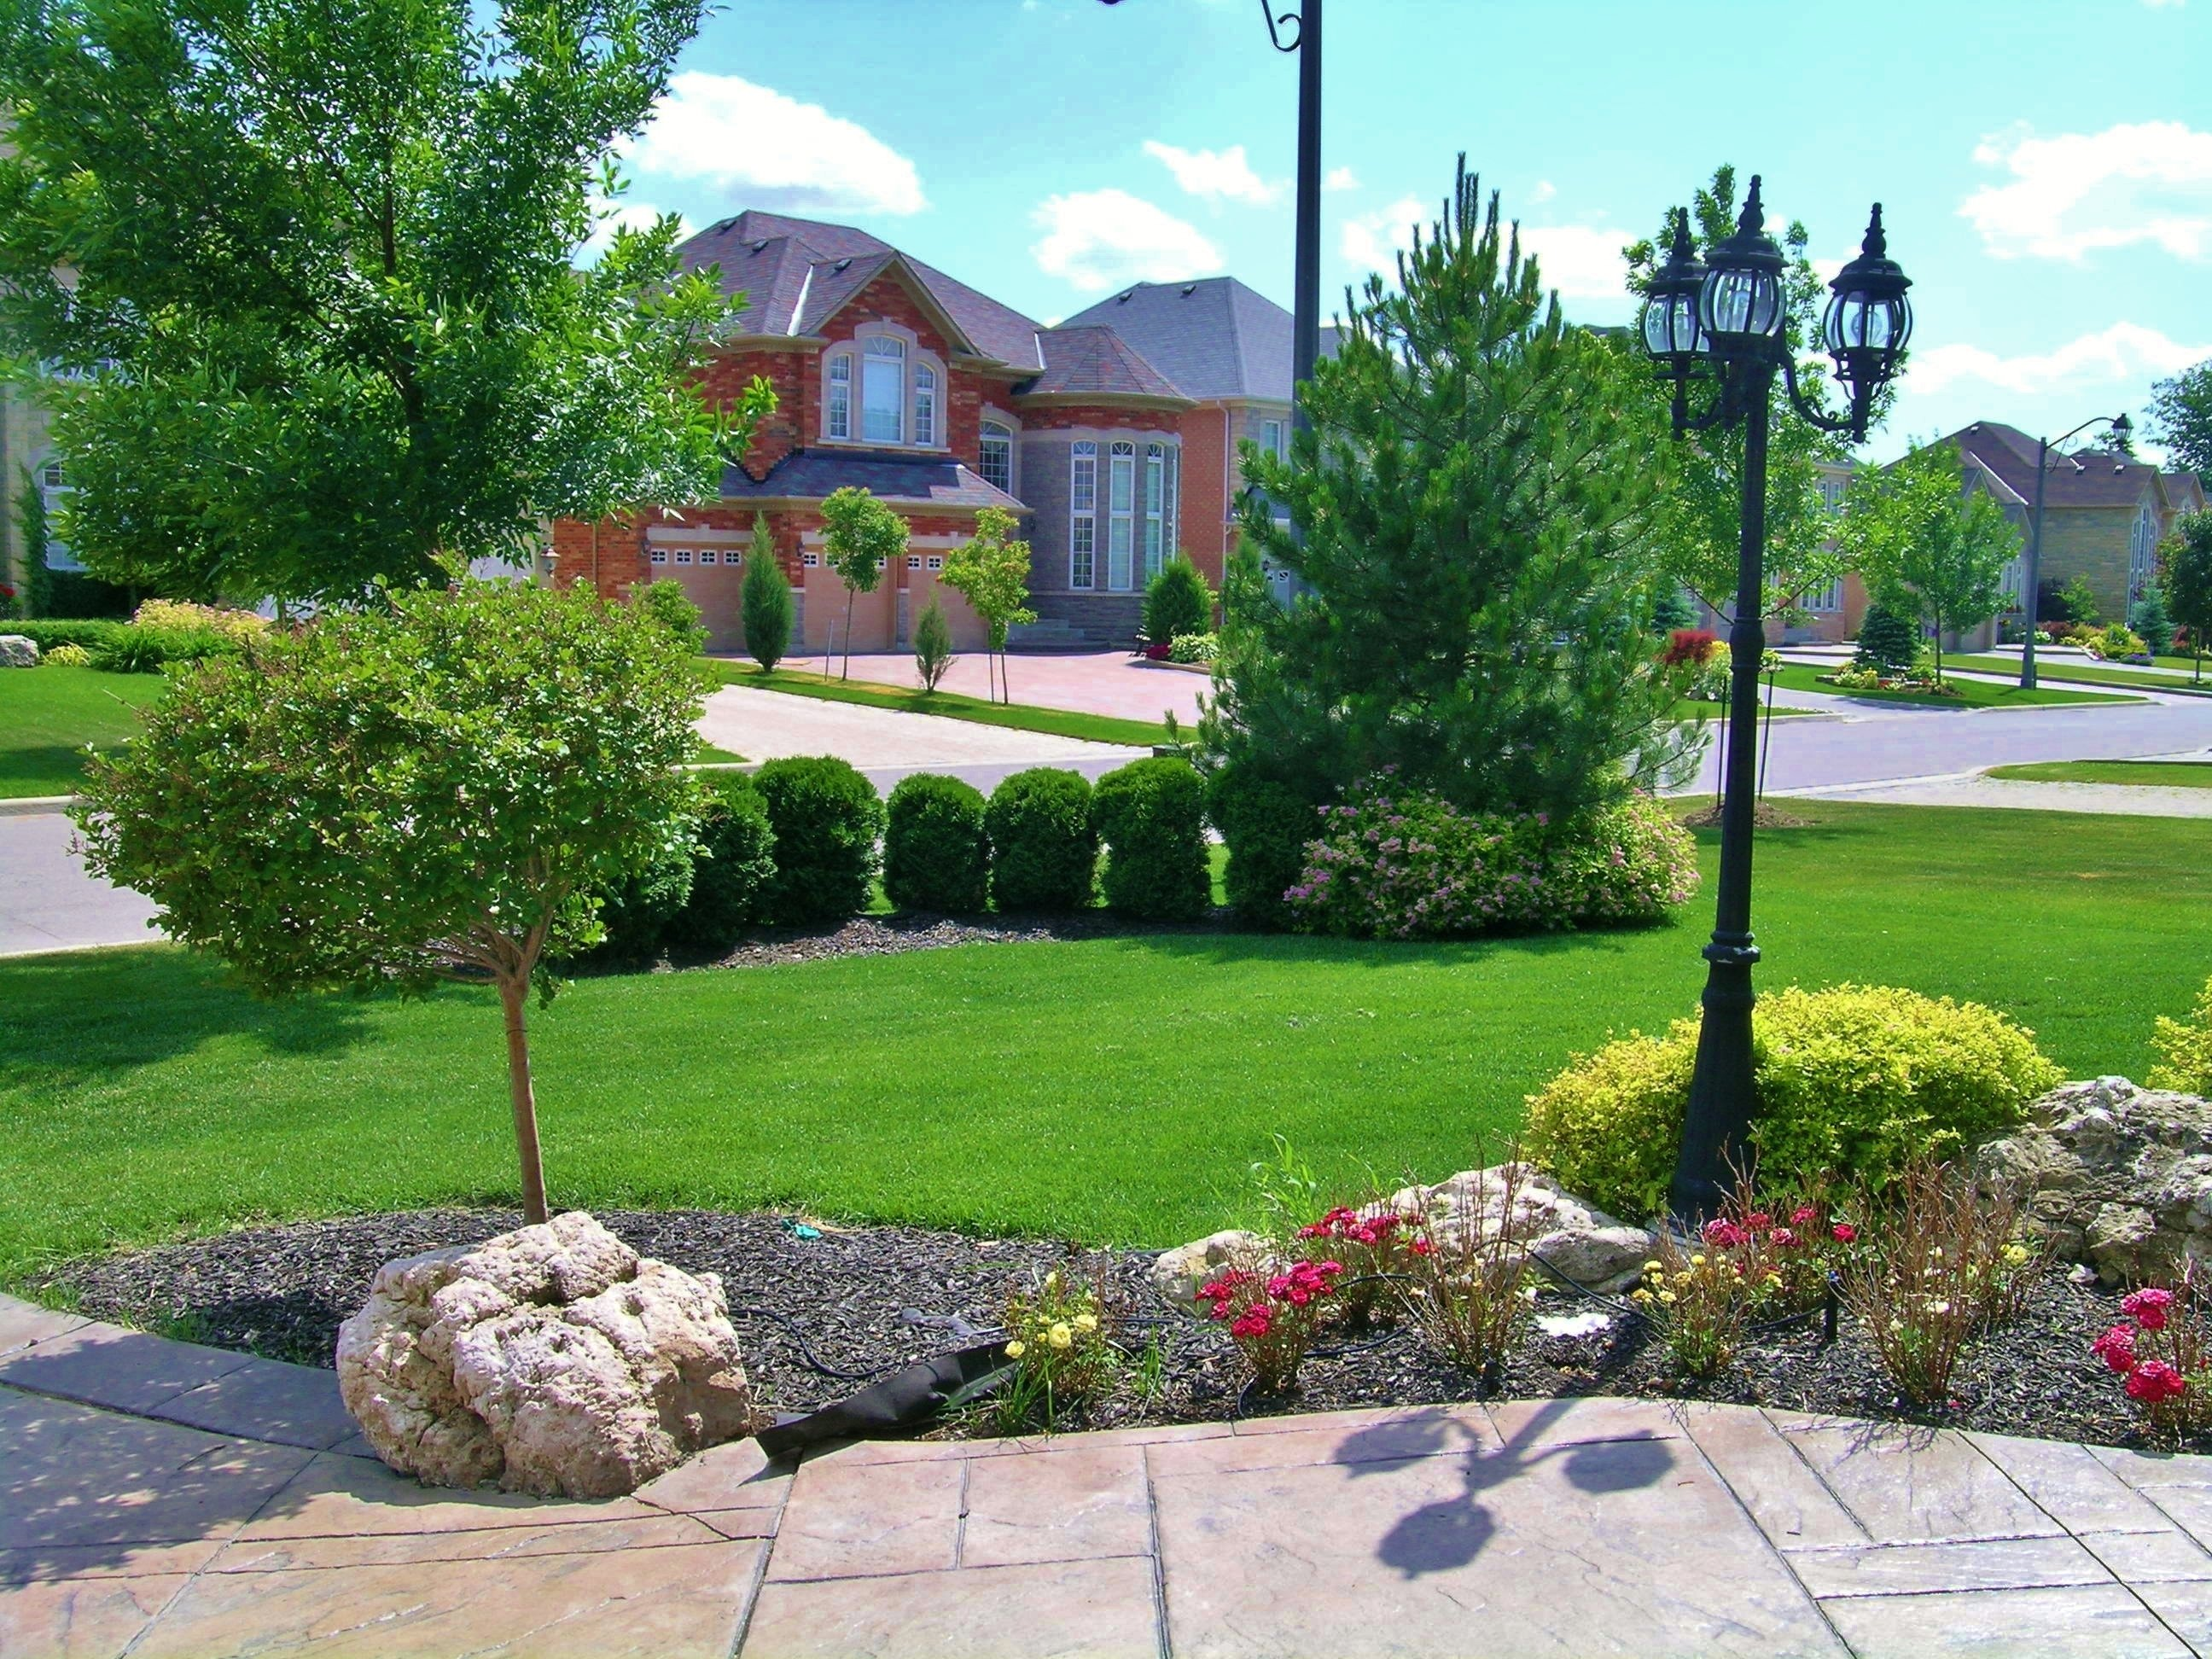 garden ideas : large front yard landscaping ideas fabulous front